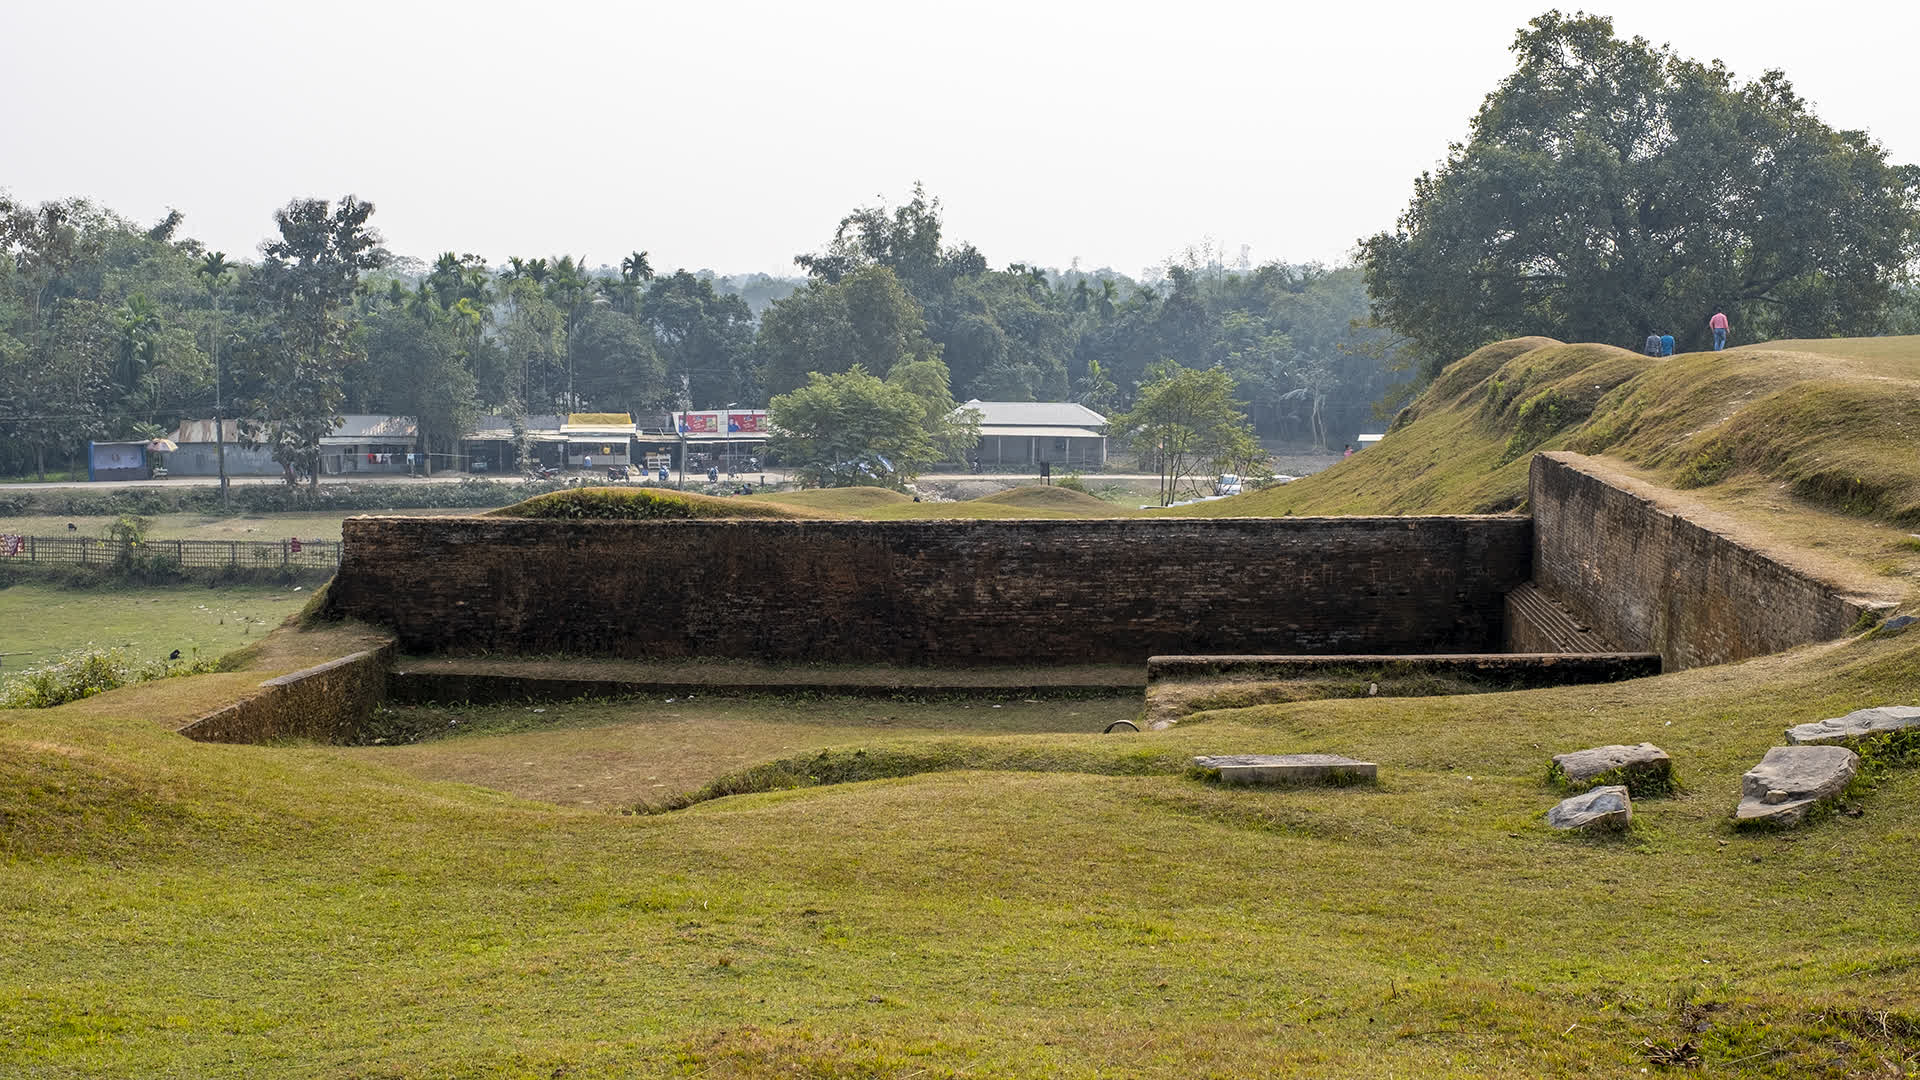 Walls of the Rajpat Fort